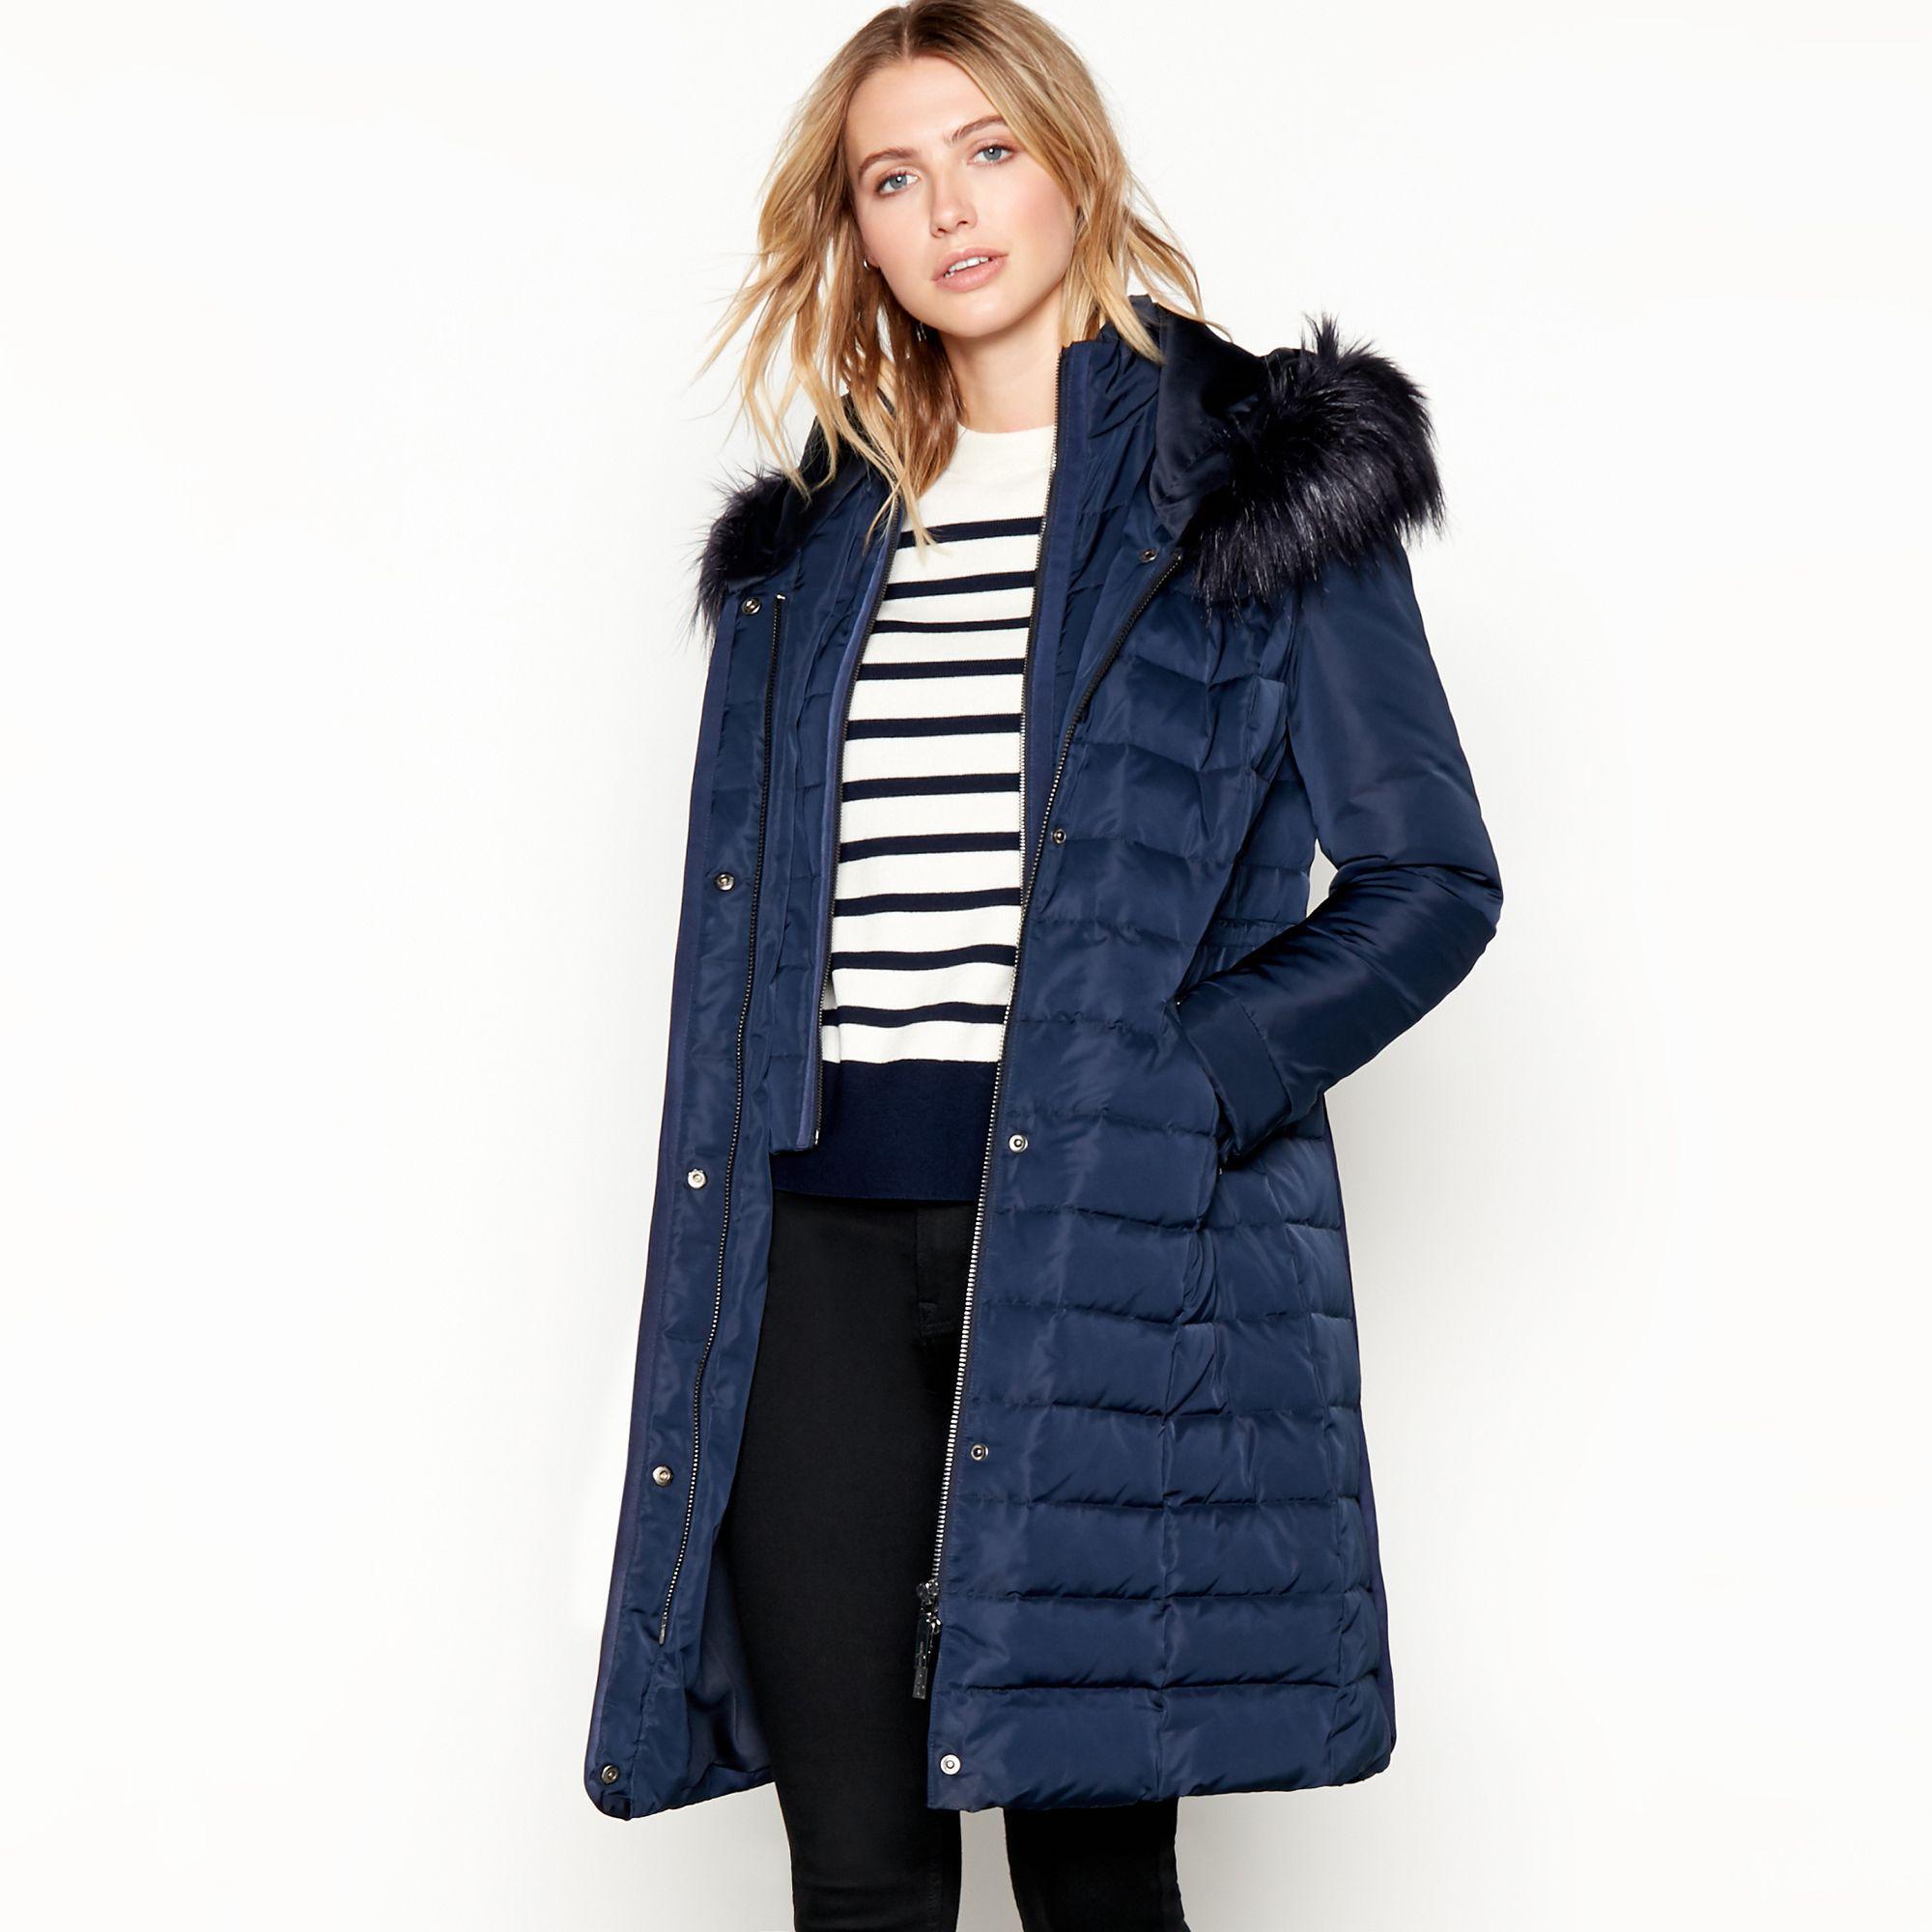 3d0d847ea J By Jasper Conran Navy 'glam' Faux Fur Hooded Drawstring Waist ...